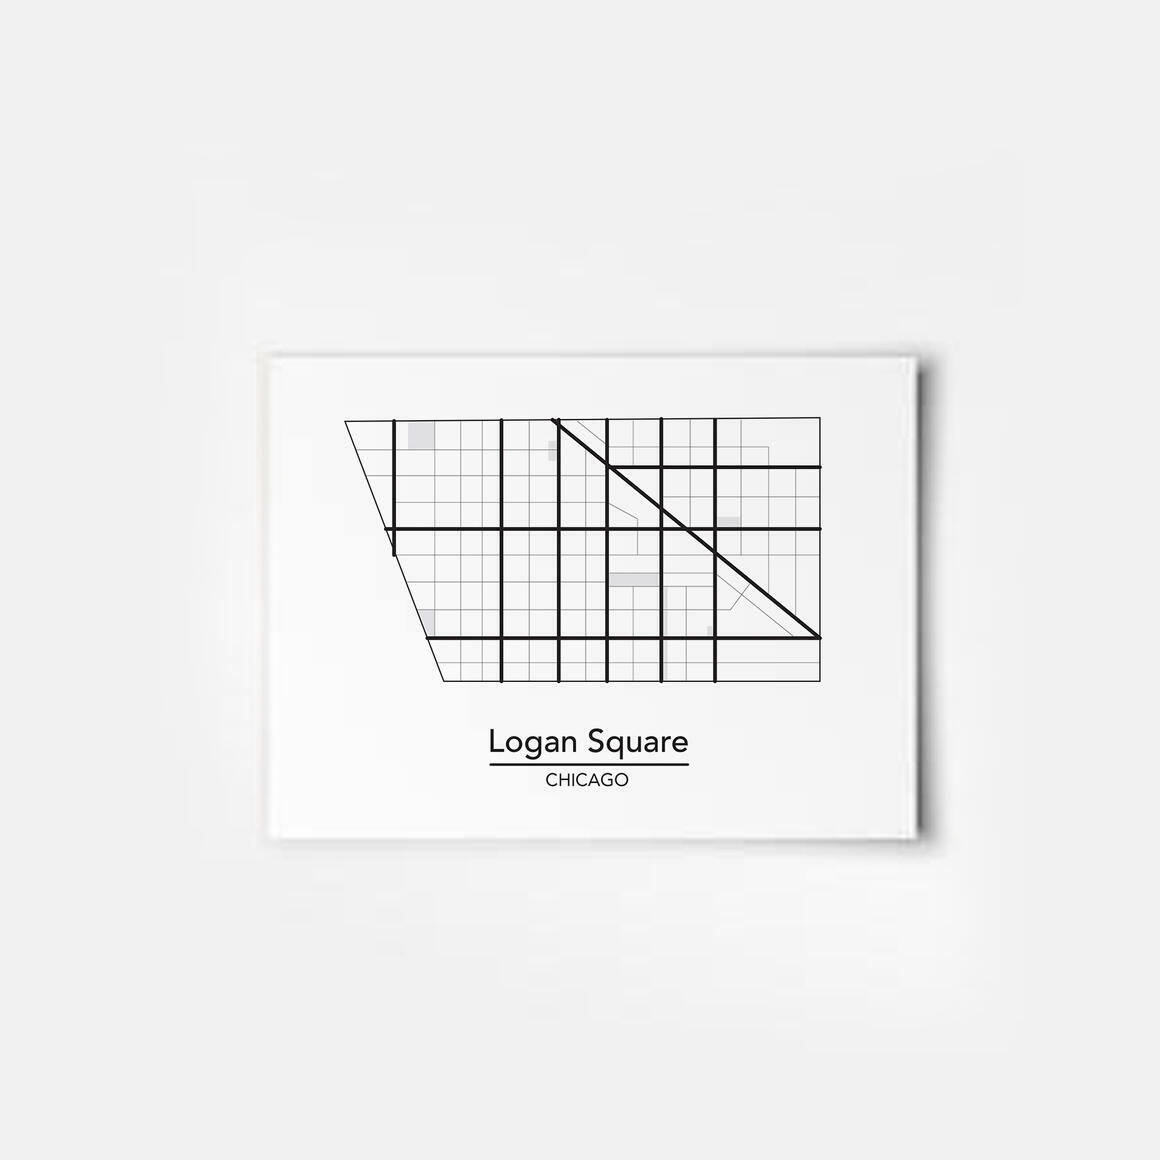 Logan Square - Chicago Neighborhood Map Print | Trada Marketplace